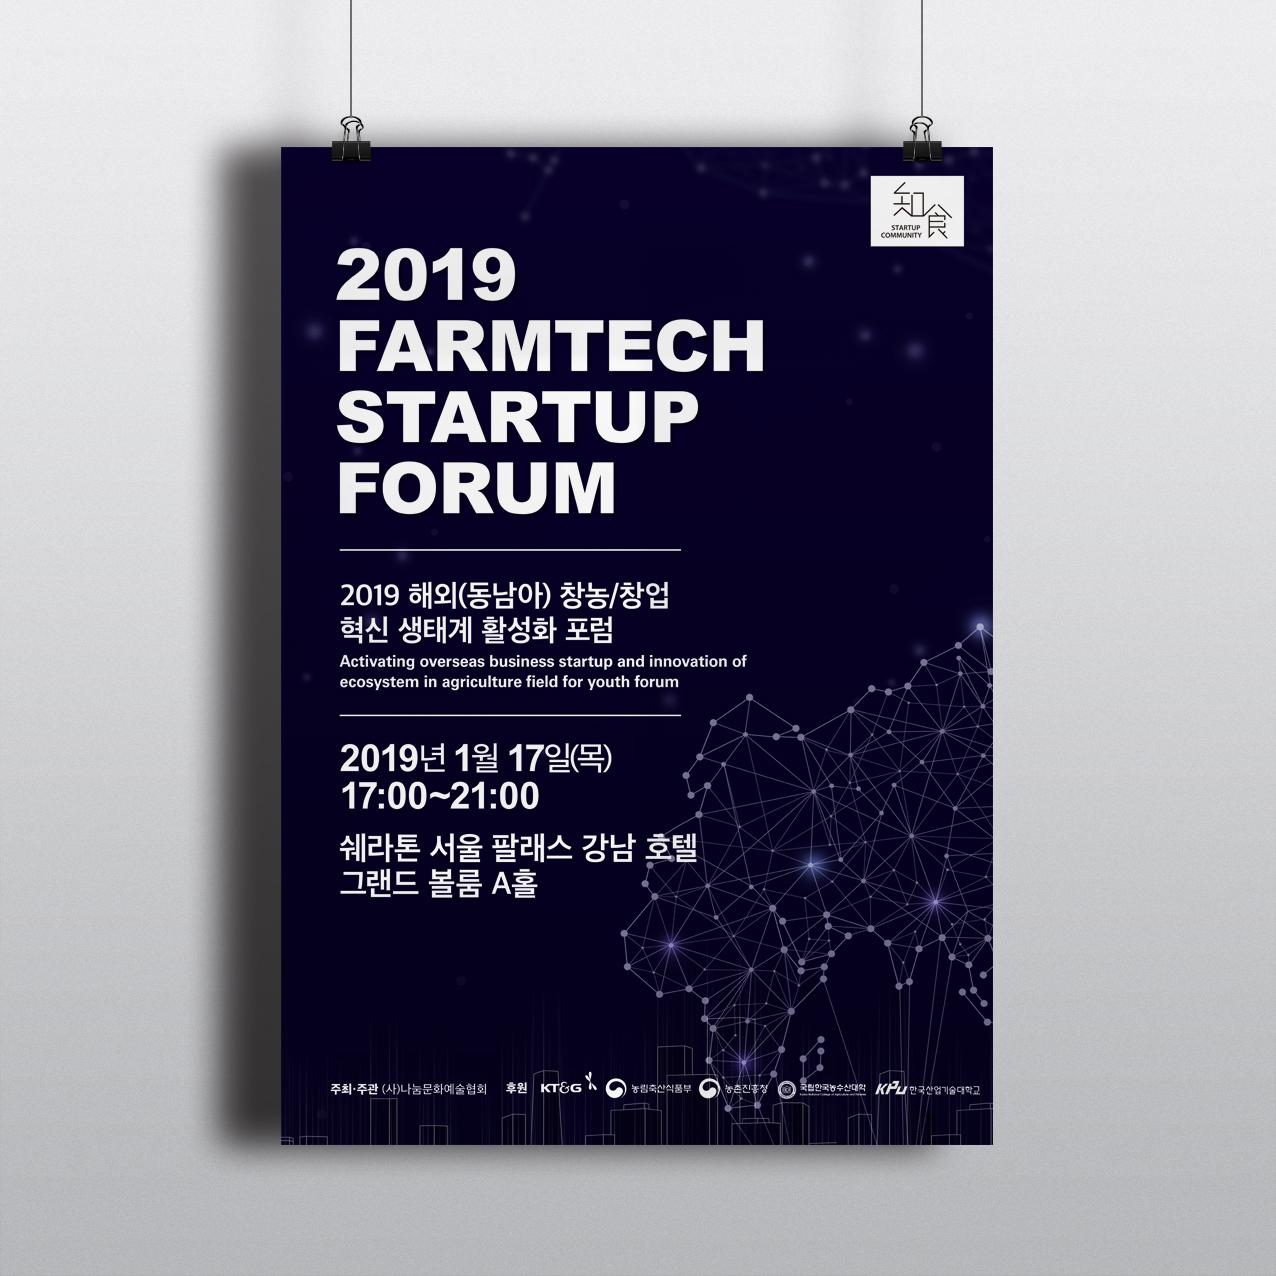 2019 FARMTECH STARTUP FORUM 포스터 디자인 시안 - 나눔문화예술협회